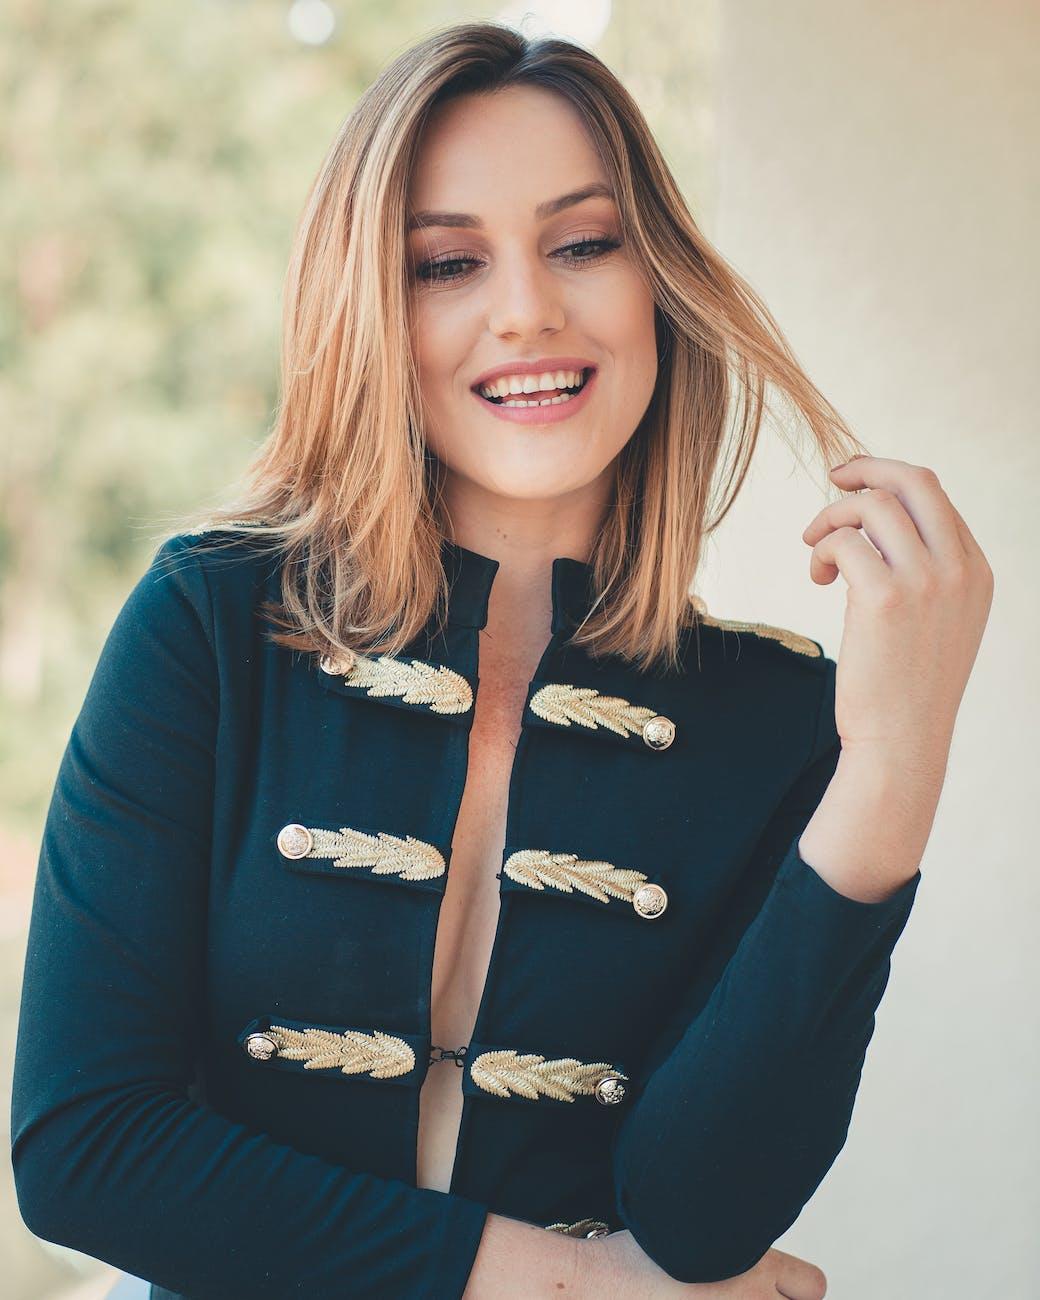 Lächelnde Frau · Kostenloses Stock Foto